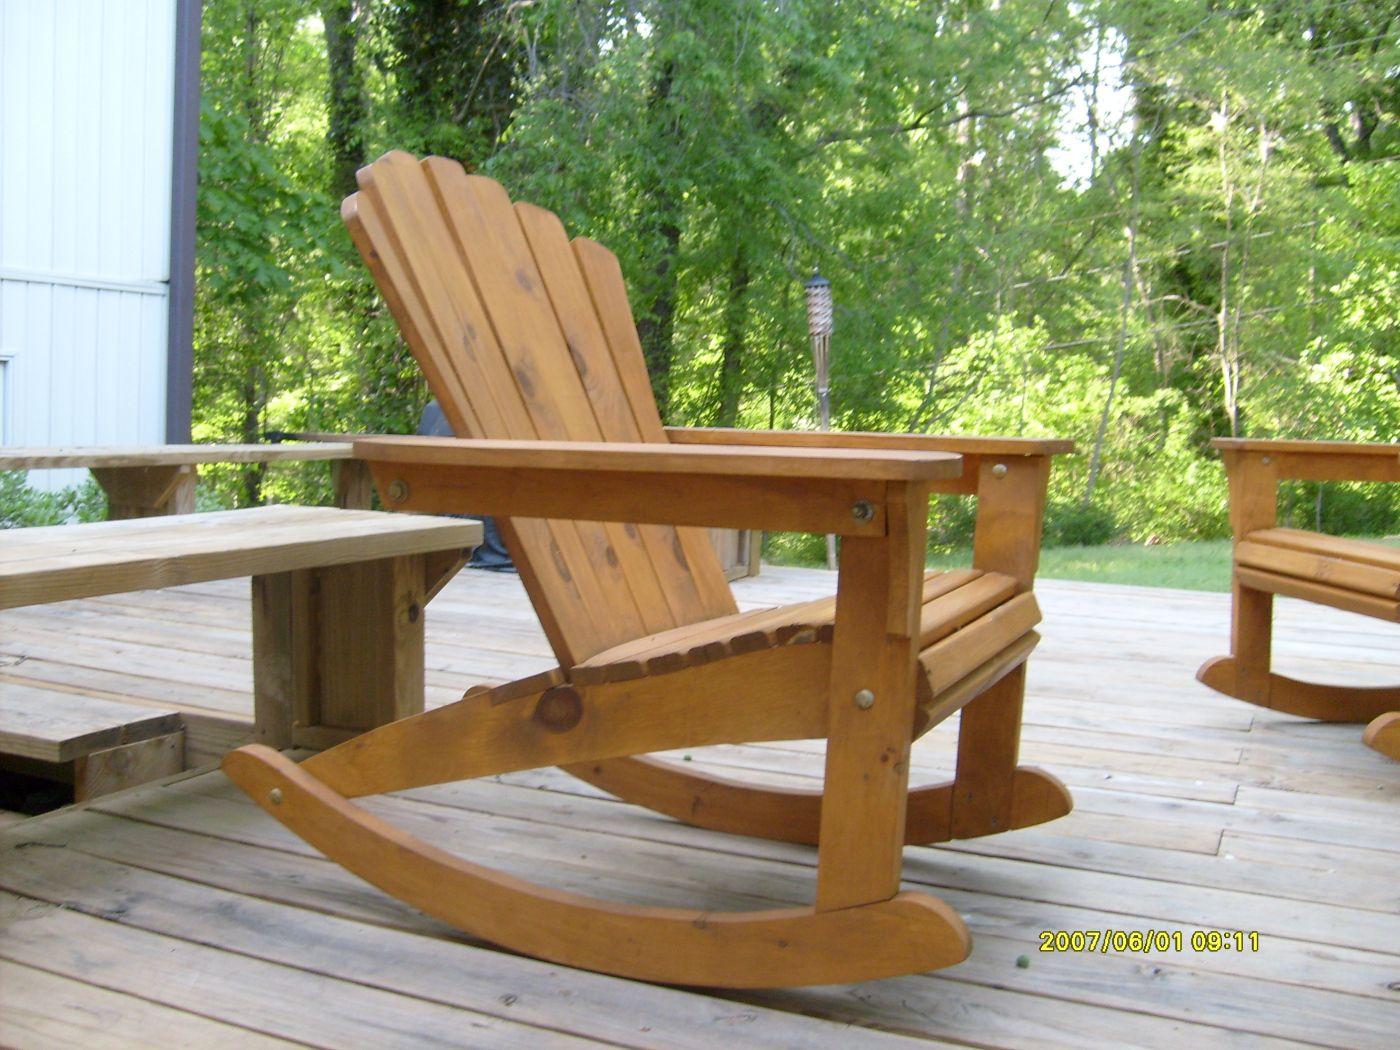 Diy Diy Adirondack Chair Kit Wooden Pdf Wood River Block Plane